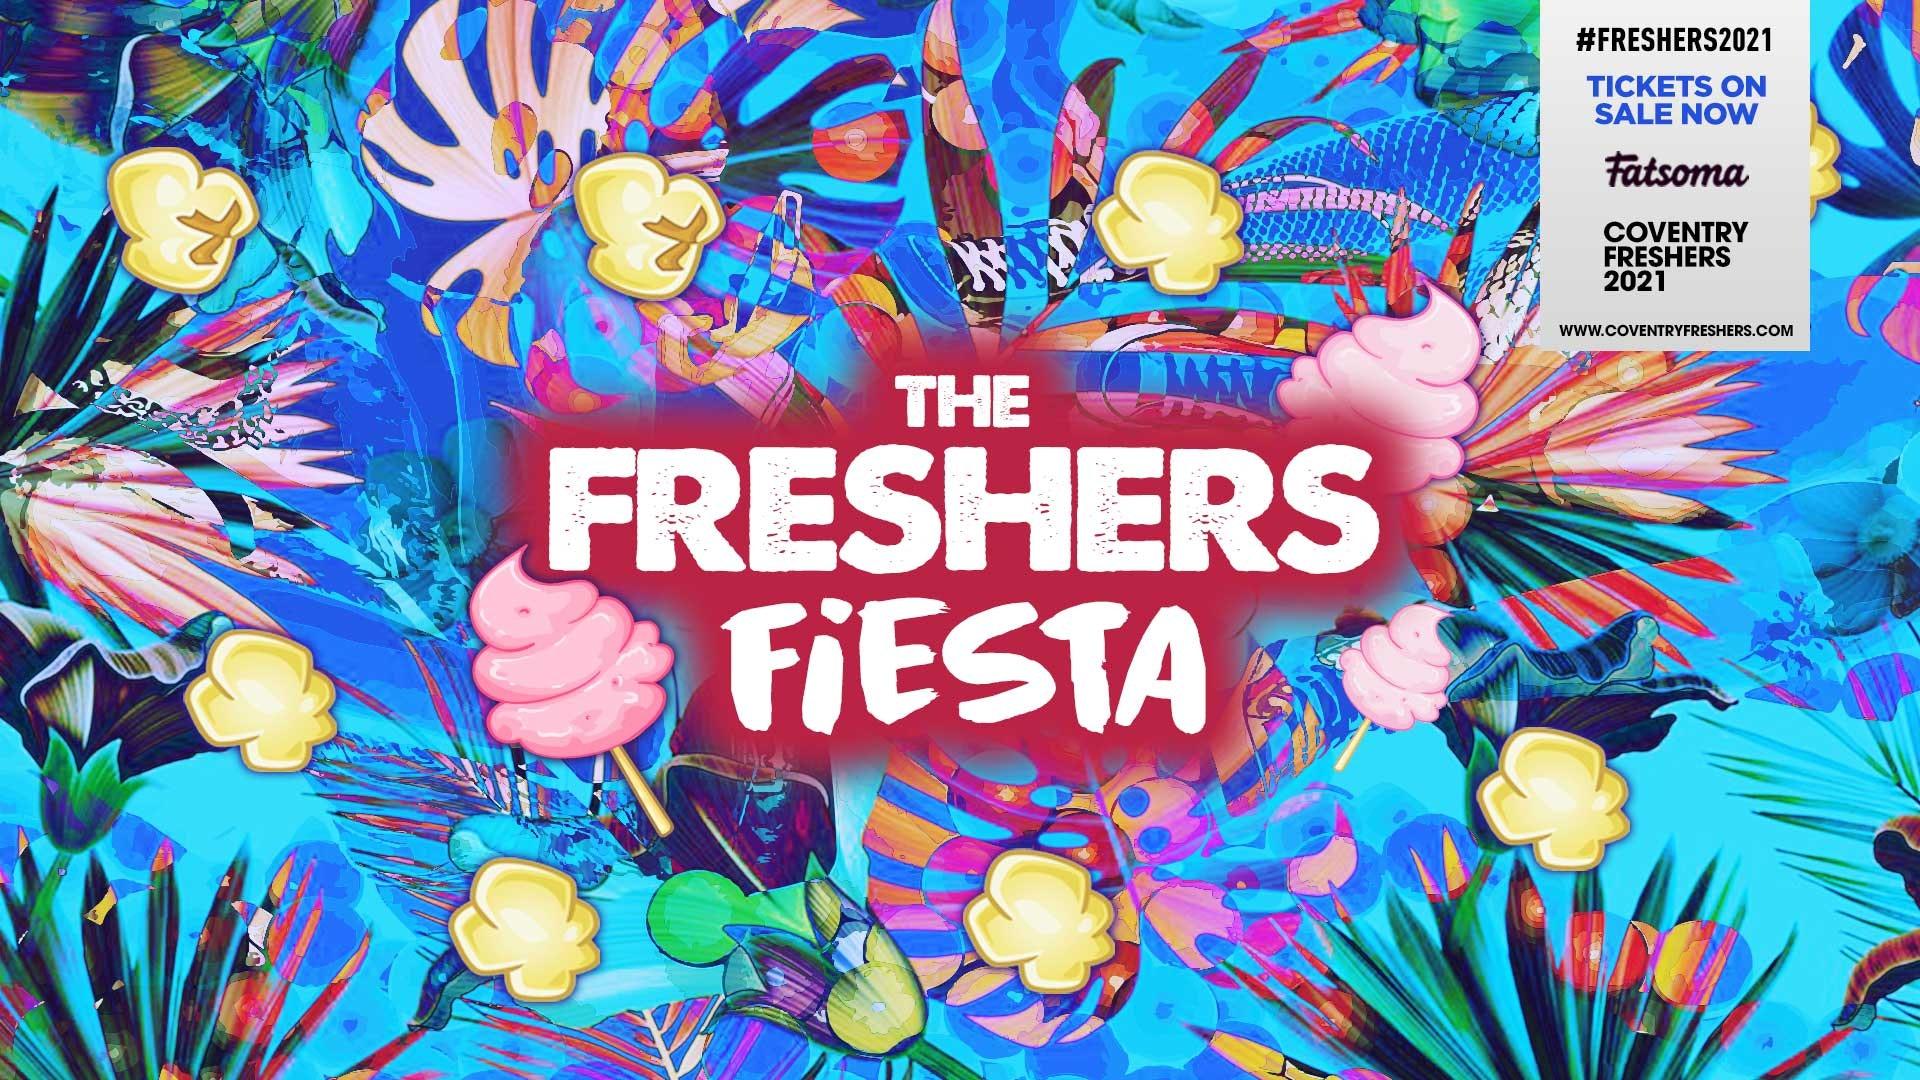 Freshers Fiesta   Coventry Freshers 2021